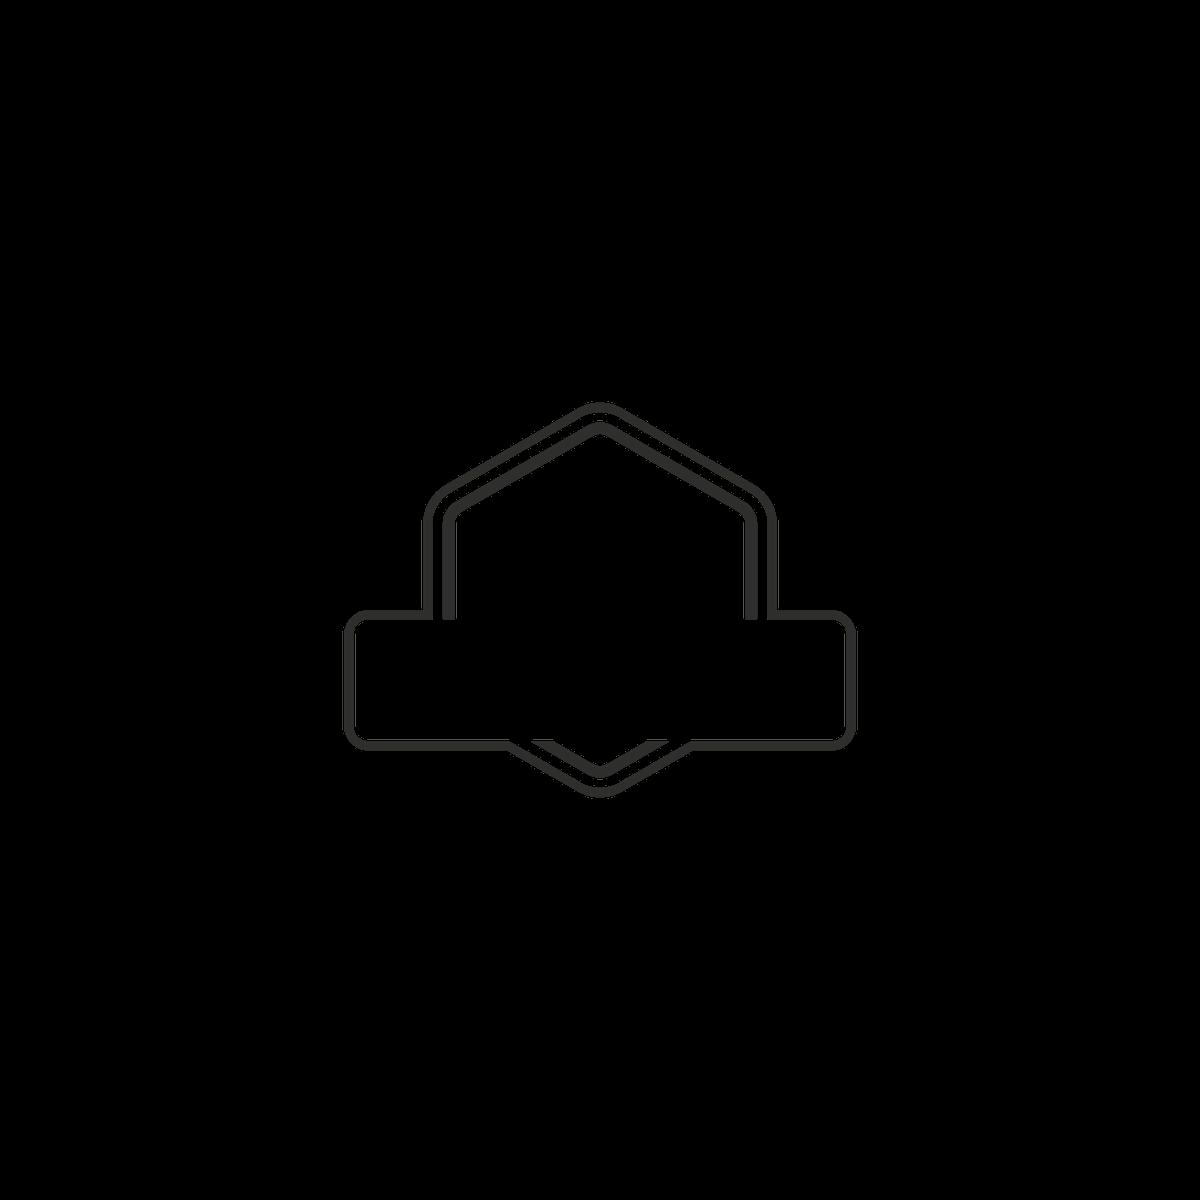 Add-on logo for Mountain Buffalo Company